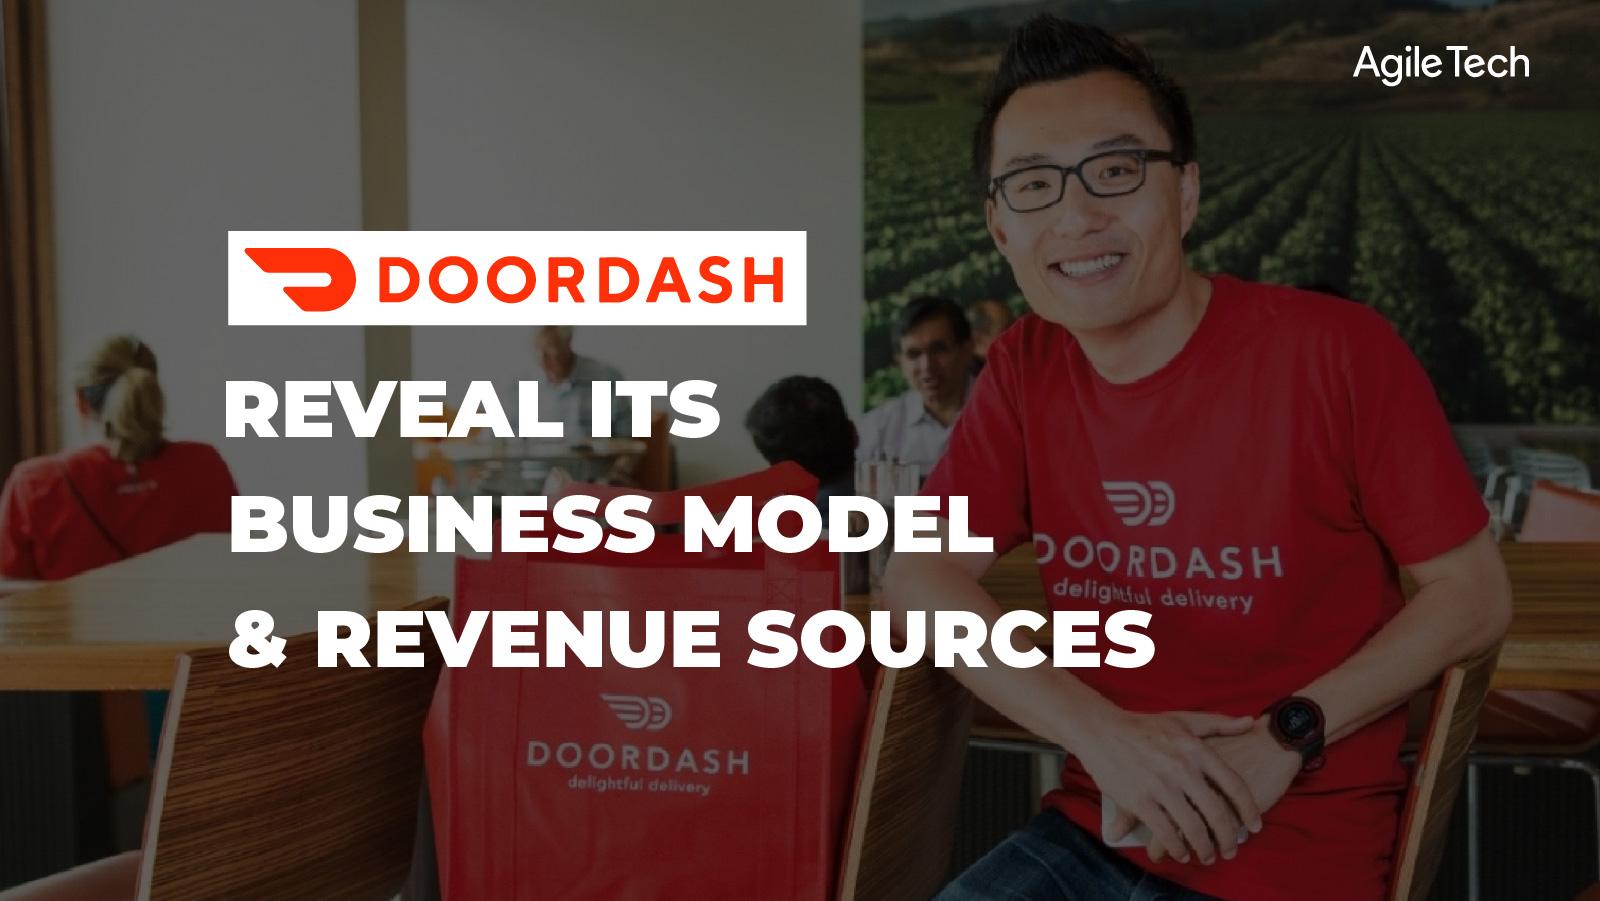 how does doordash work, business model and revenue source of doordash, food delivery platform like DoorDash, how does on-demand app make money, agiletech